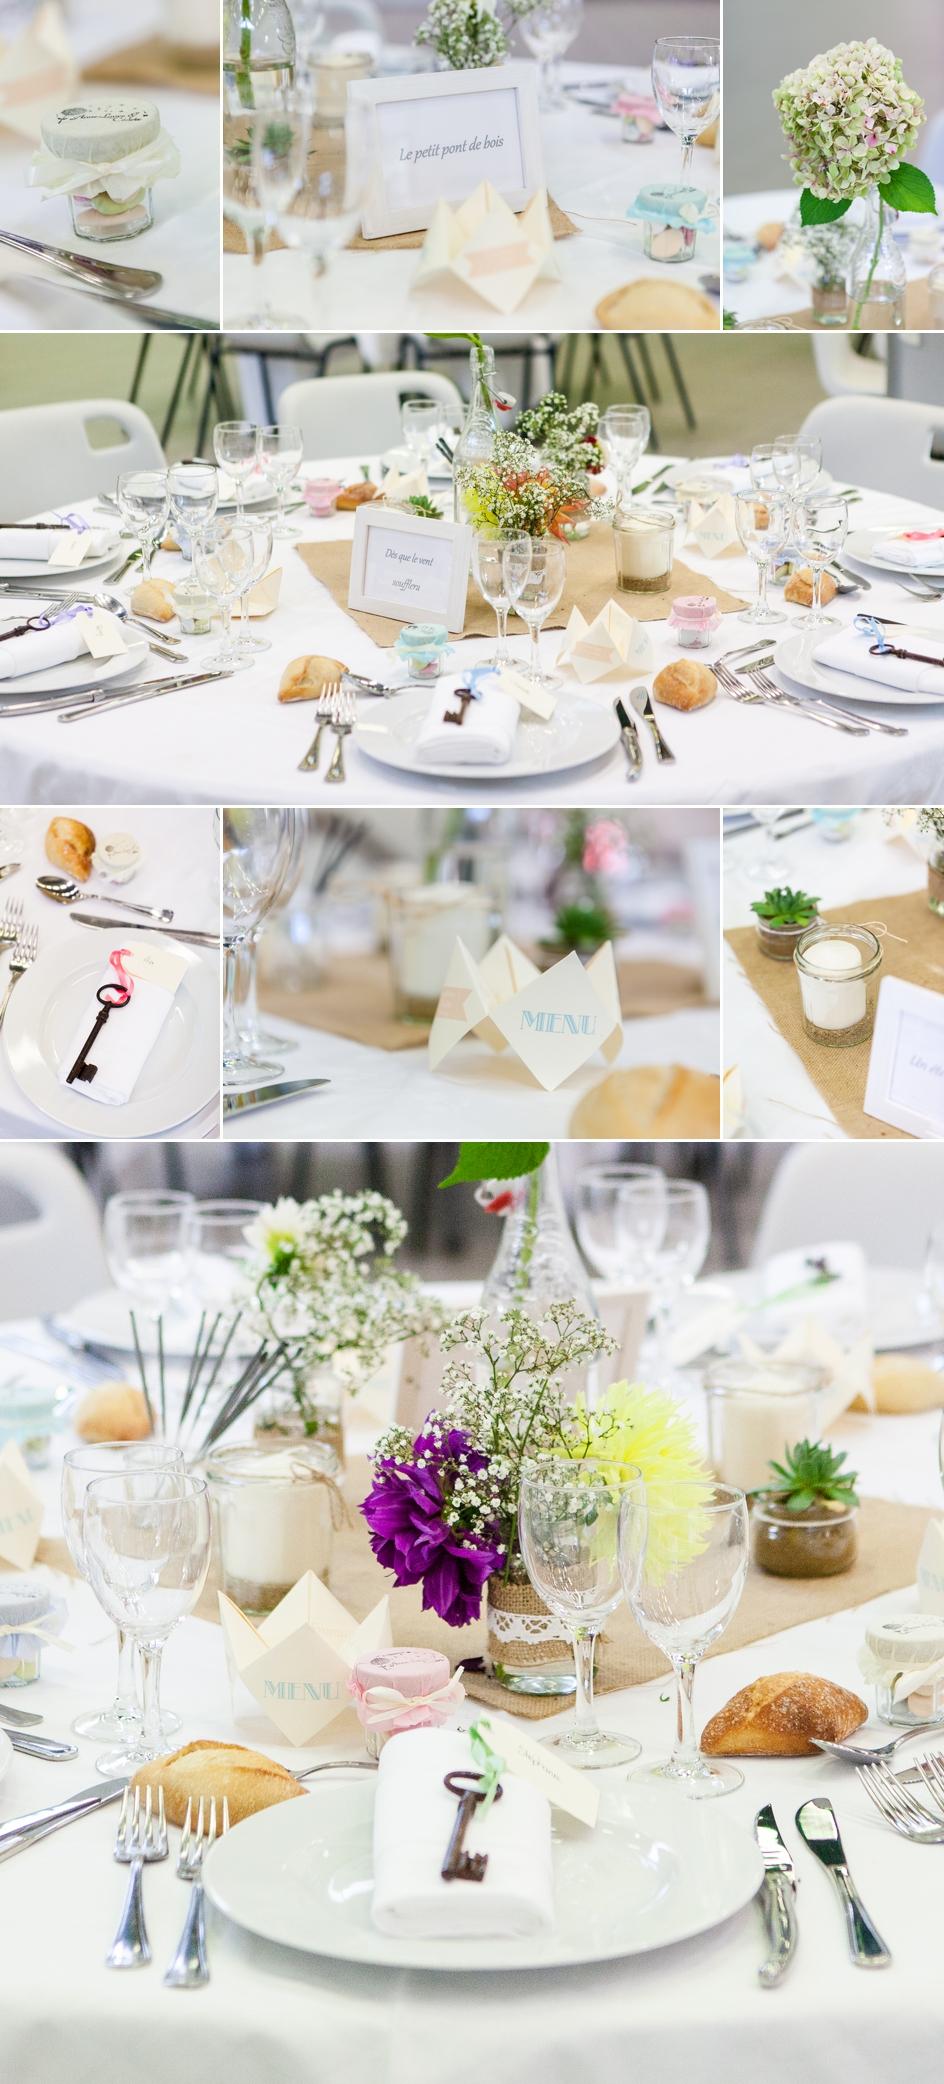 32-TABLE DE MARIAGE-